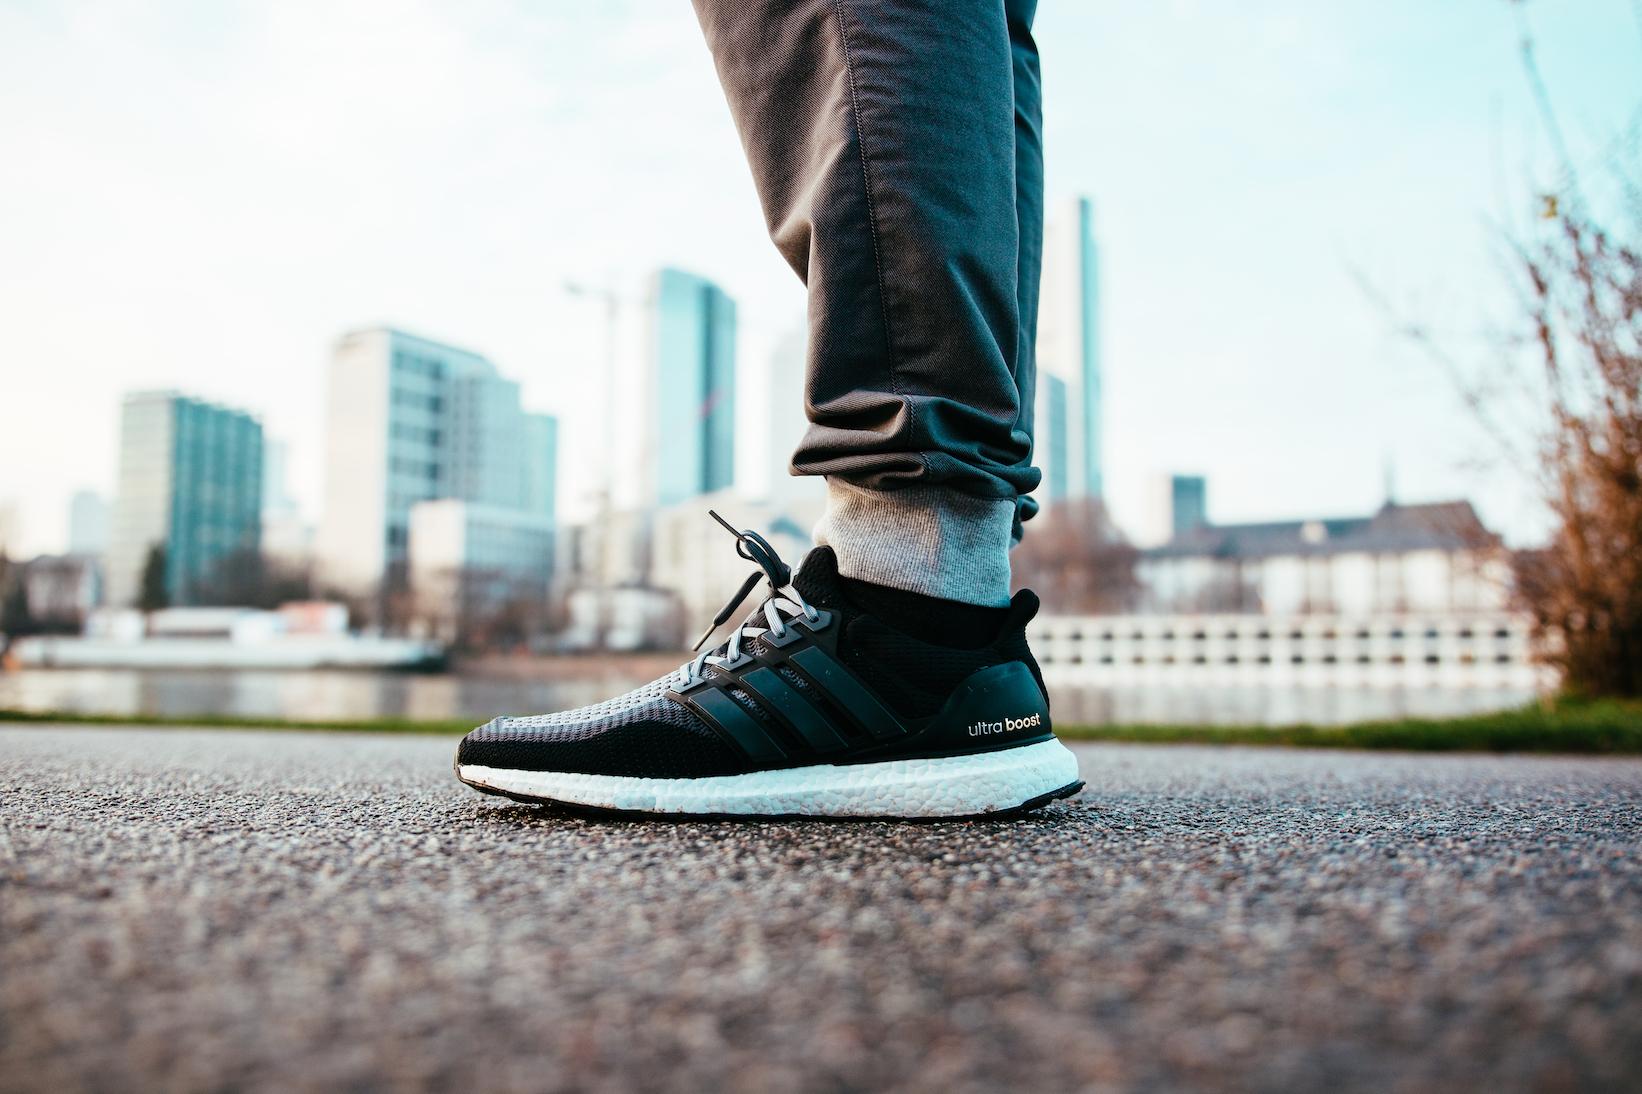 adidas_ultra_boost_ss16_zuhloo_13